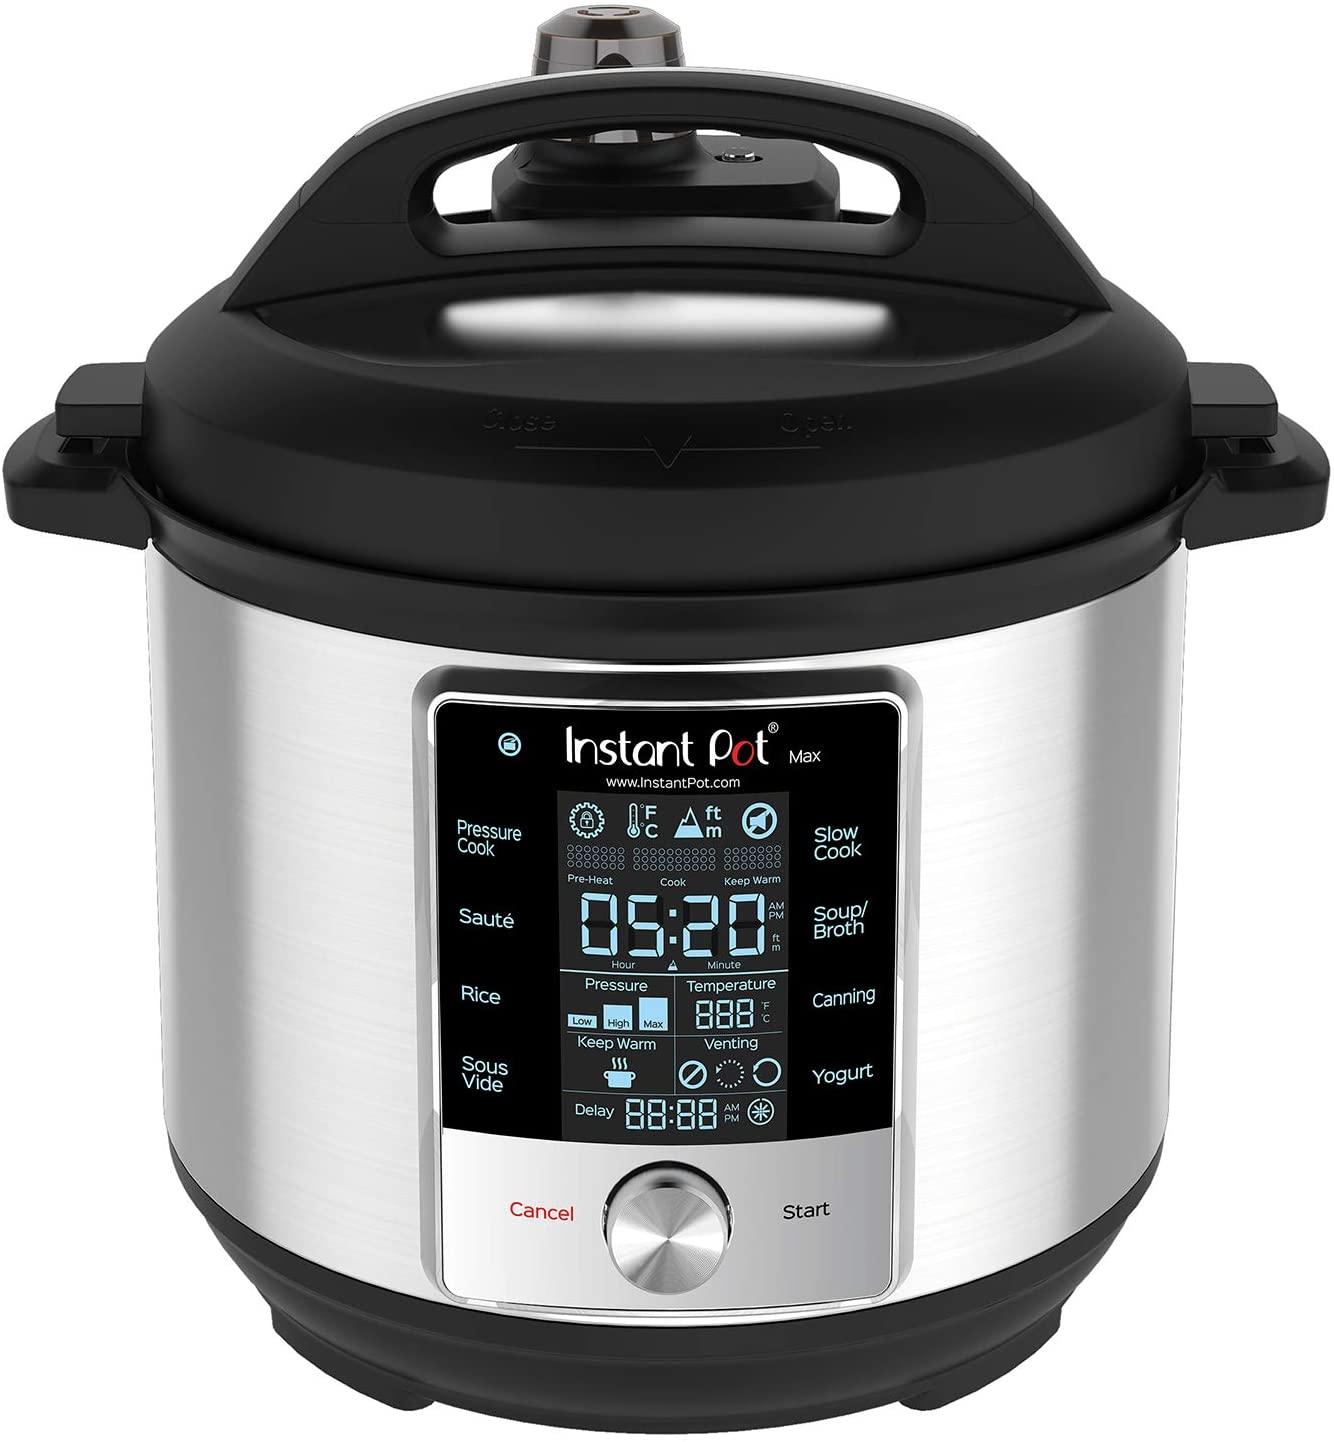 Instant Pot Max Pressure Cooker 9 in 1